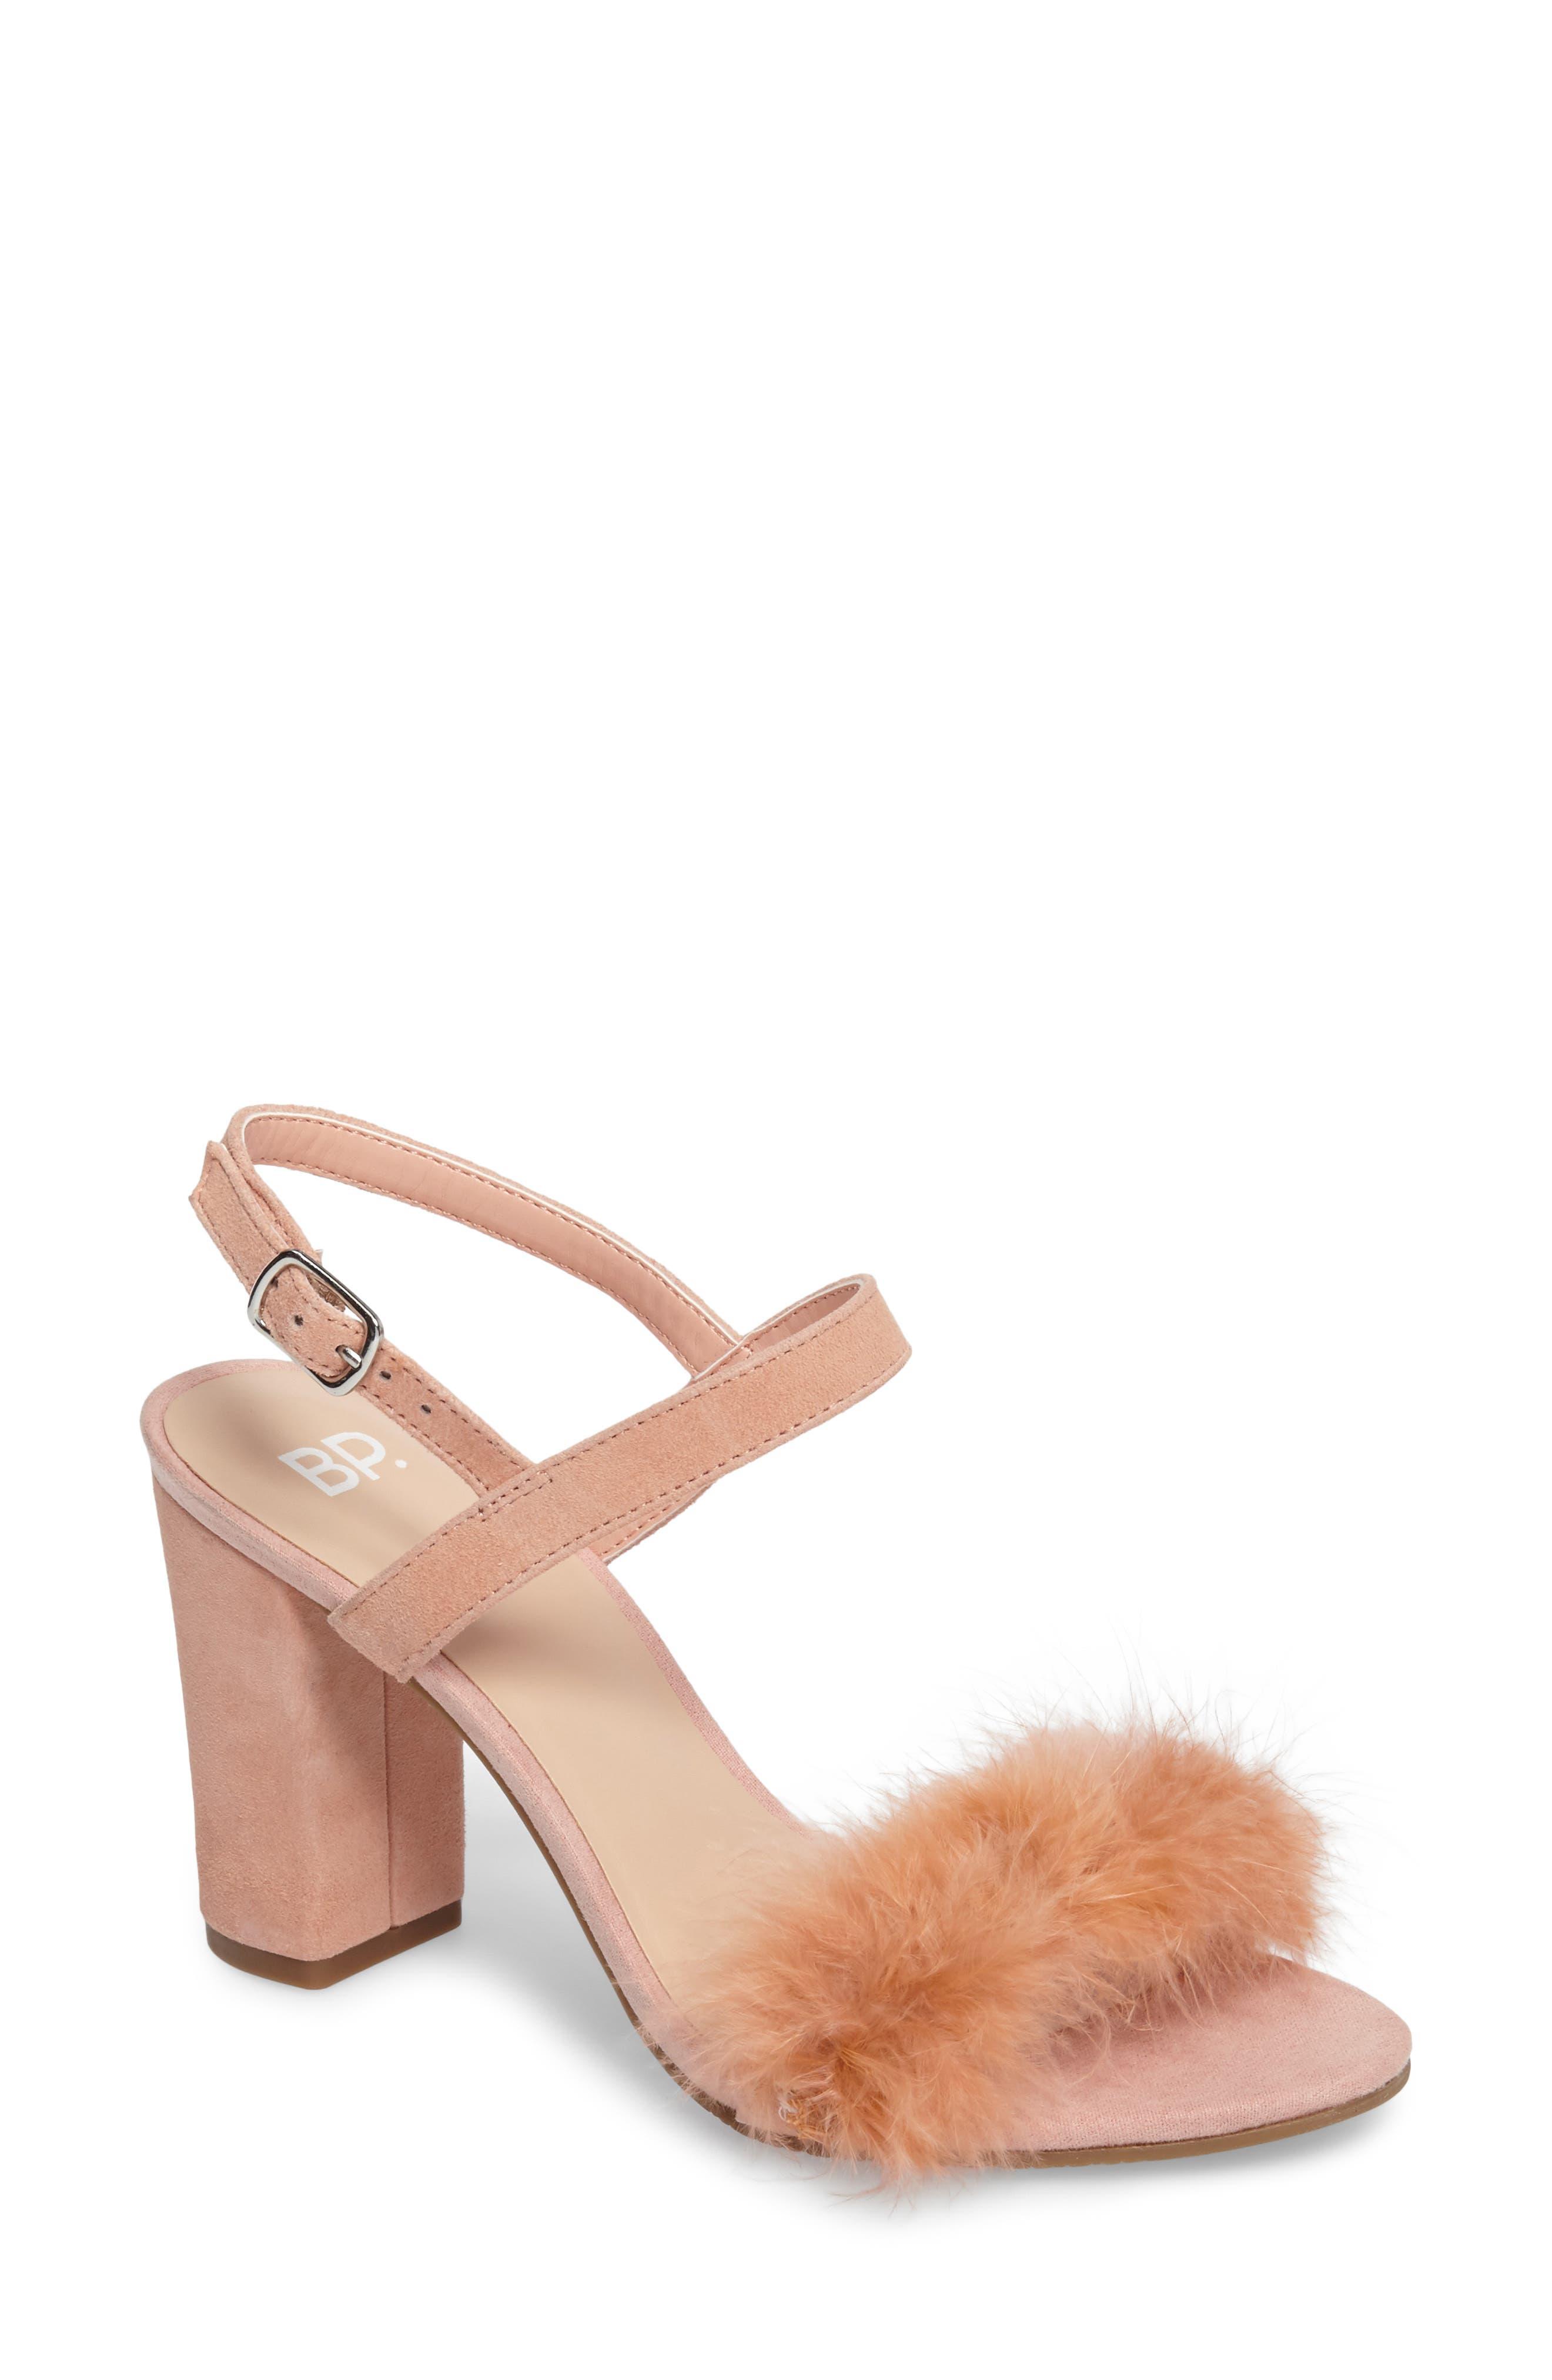 Lula Block Heel Slingback Sandal,                         Main,                         color, Blush Feathers